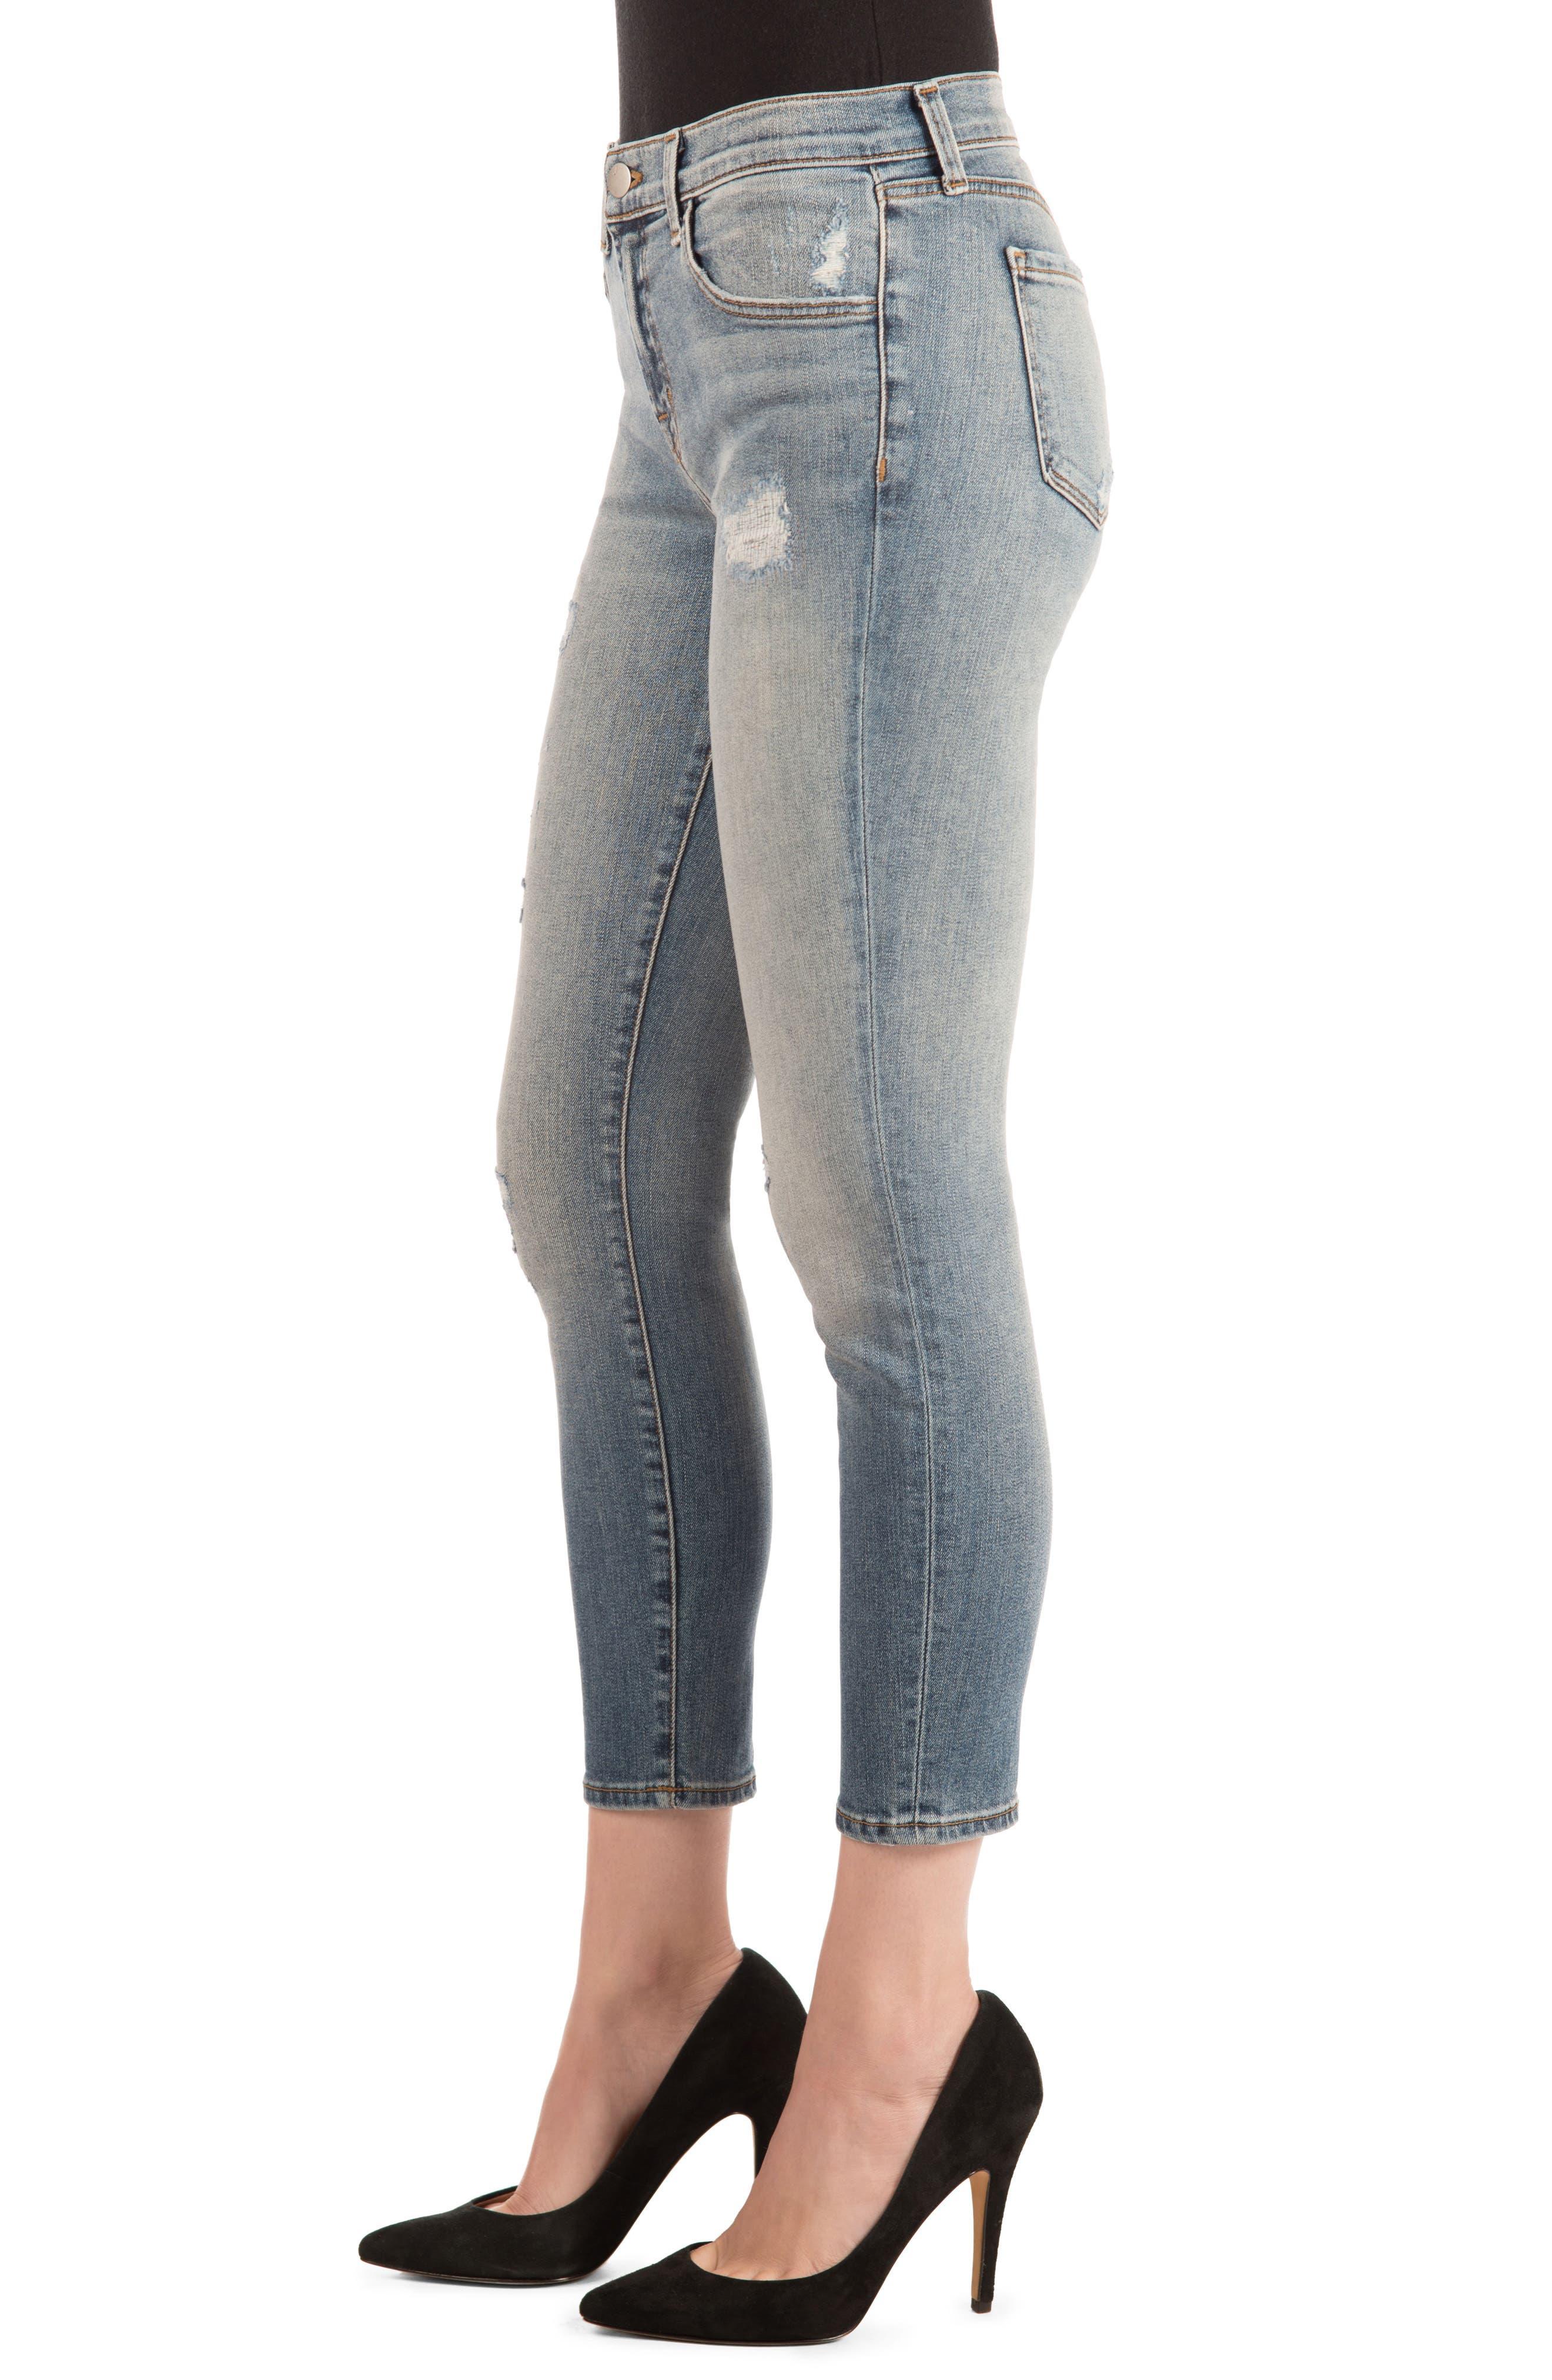 835 Distressed Capri Skinny Jeans,                             Alternate thumbnail 3, color,                             Nolita